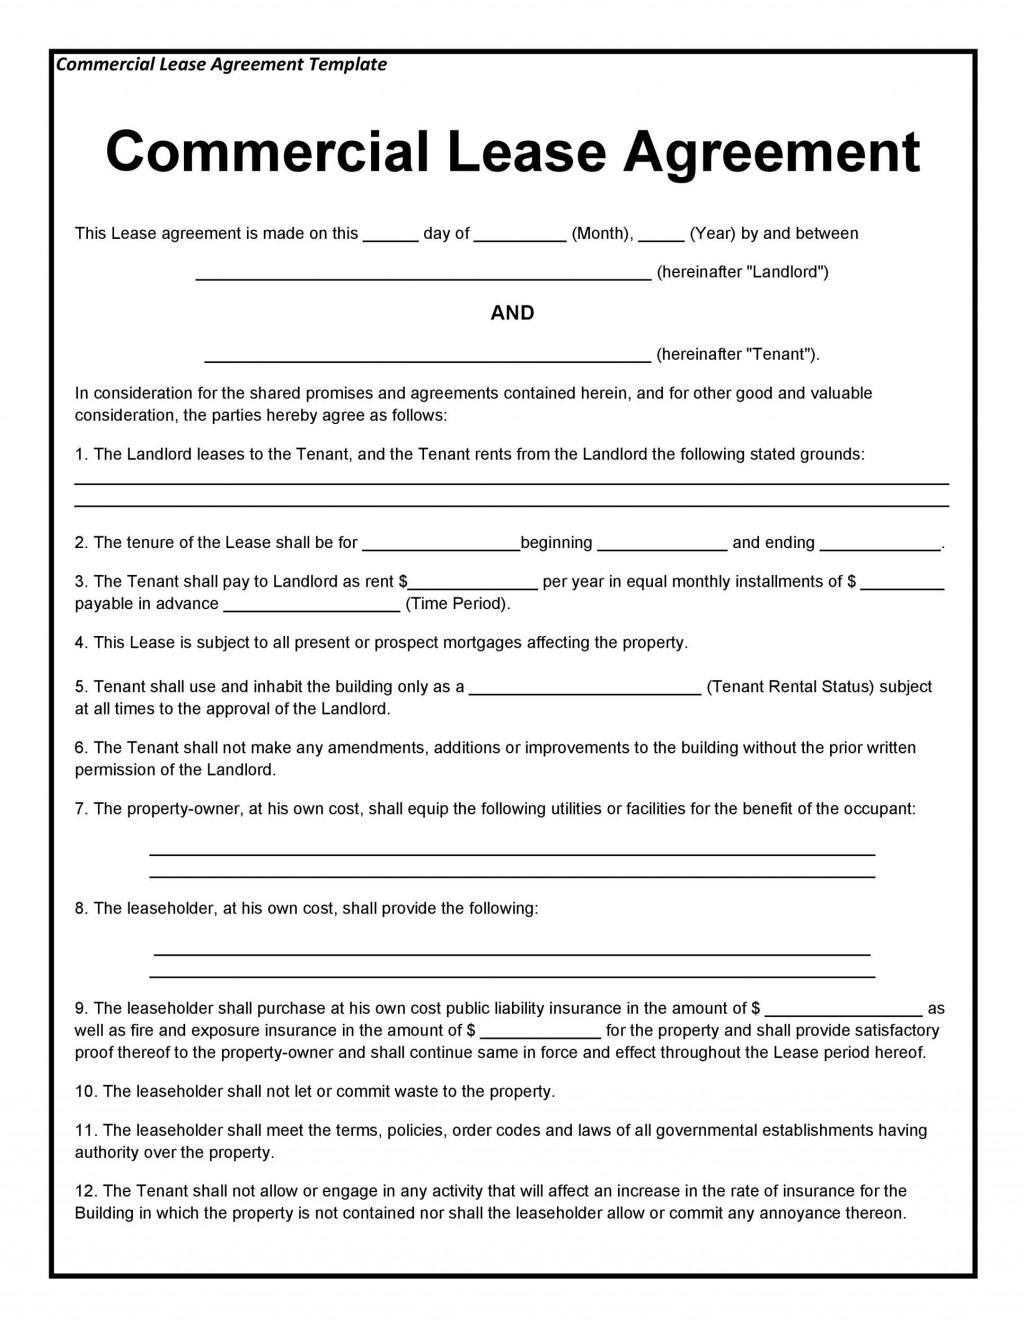 002 Striking Tenancy Agreement Template Word Free High Resolution  Uk 2020 Rental Doc LeaseLarge